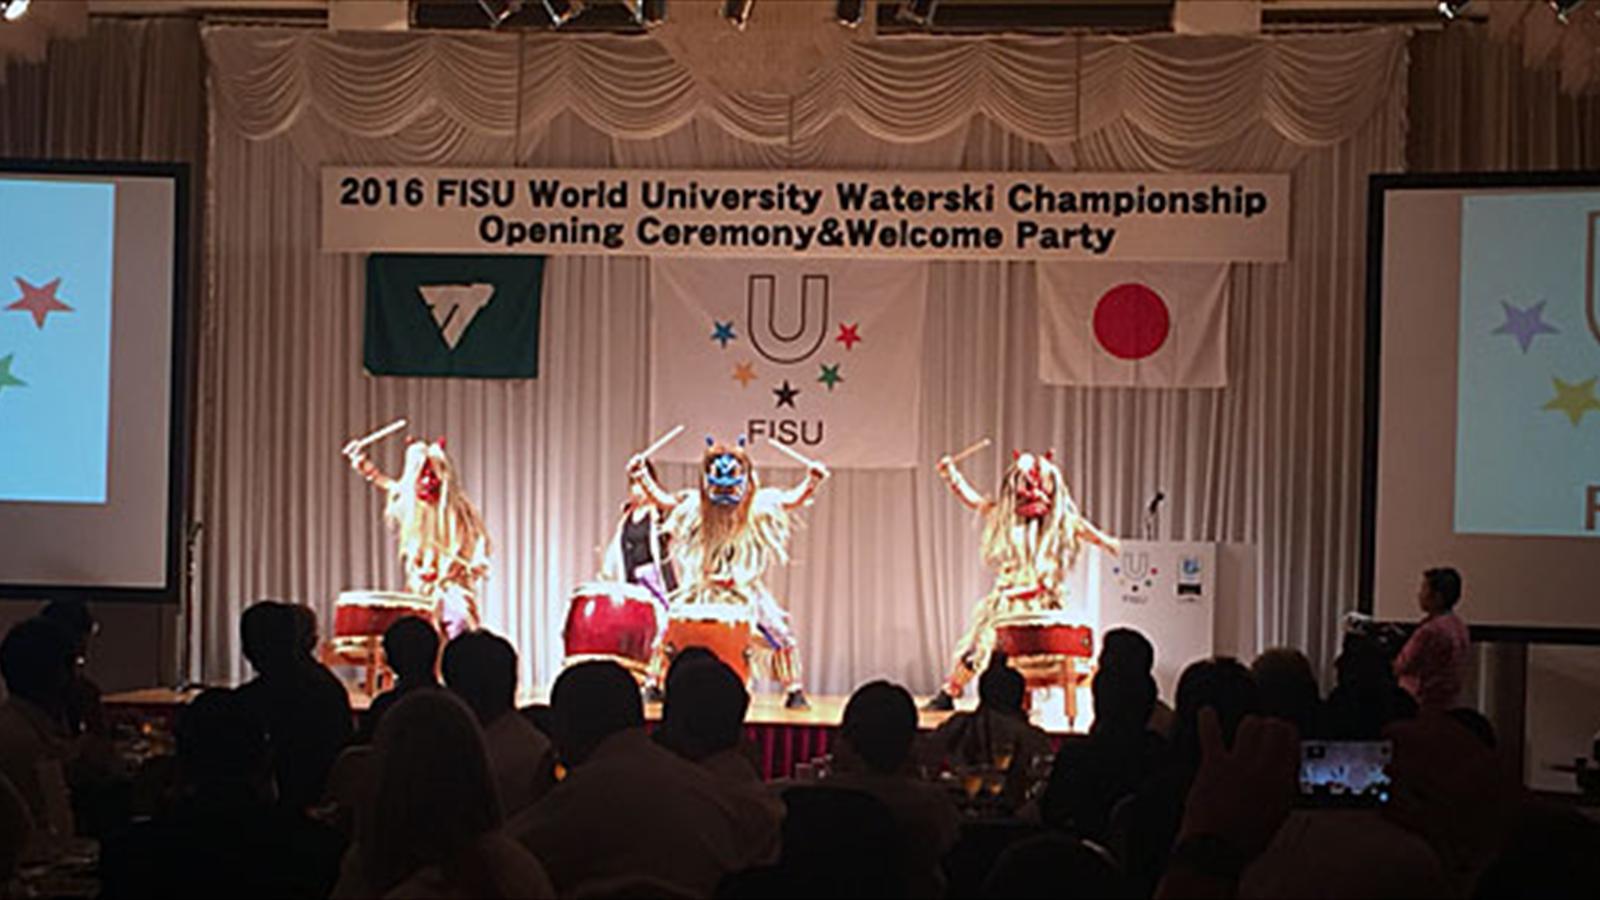 4th wuc waterski opens in akita japan university sports - University league tables french ...